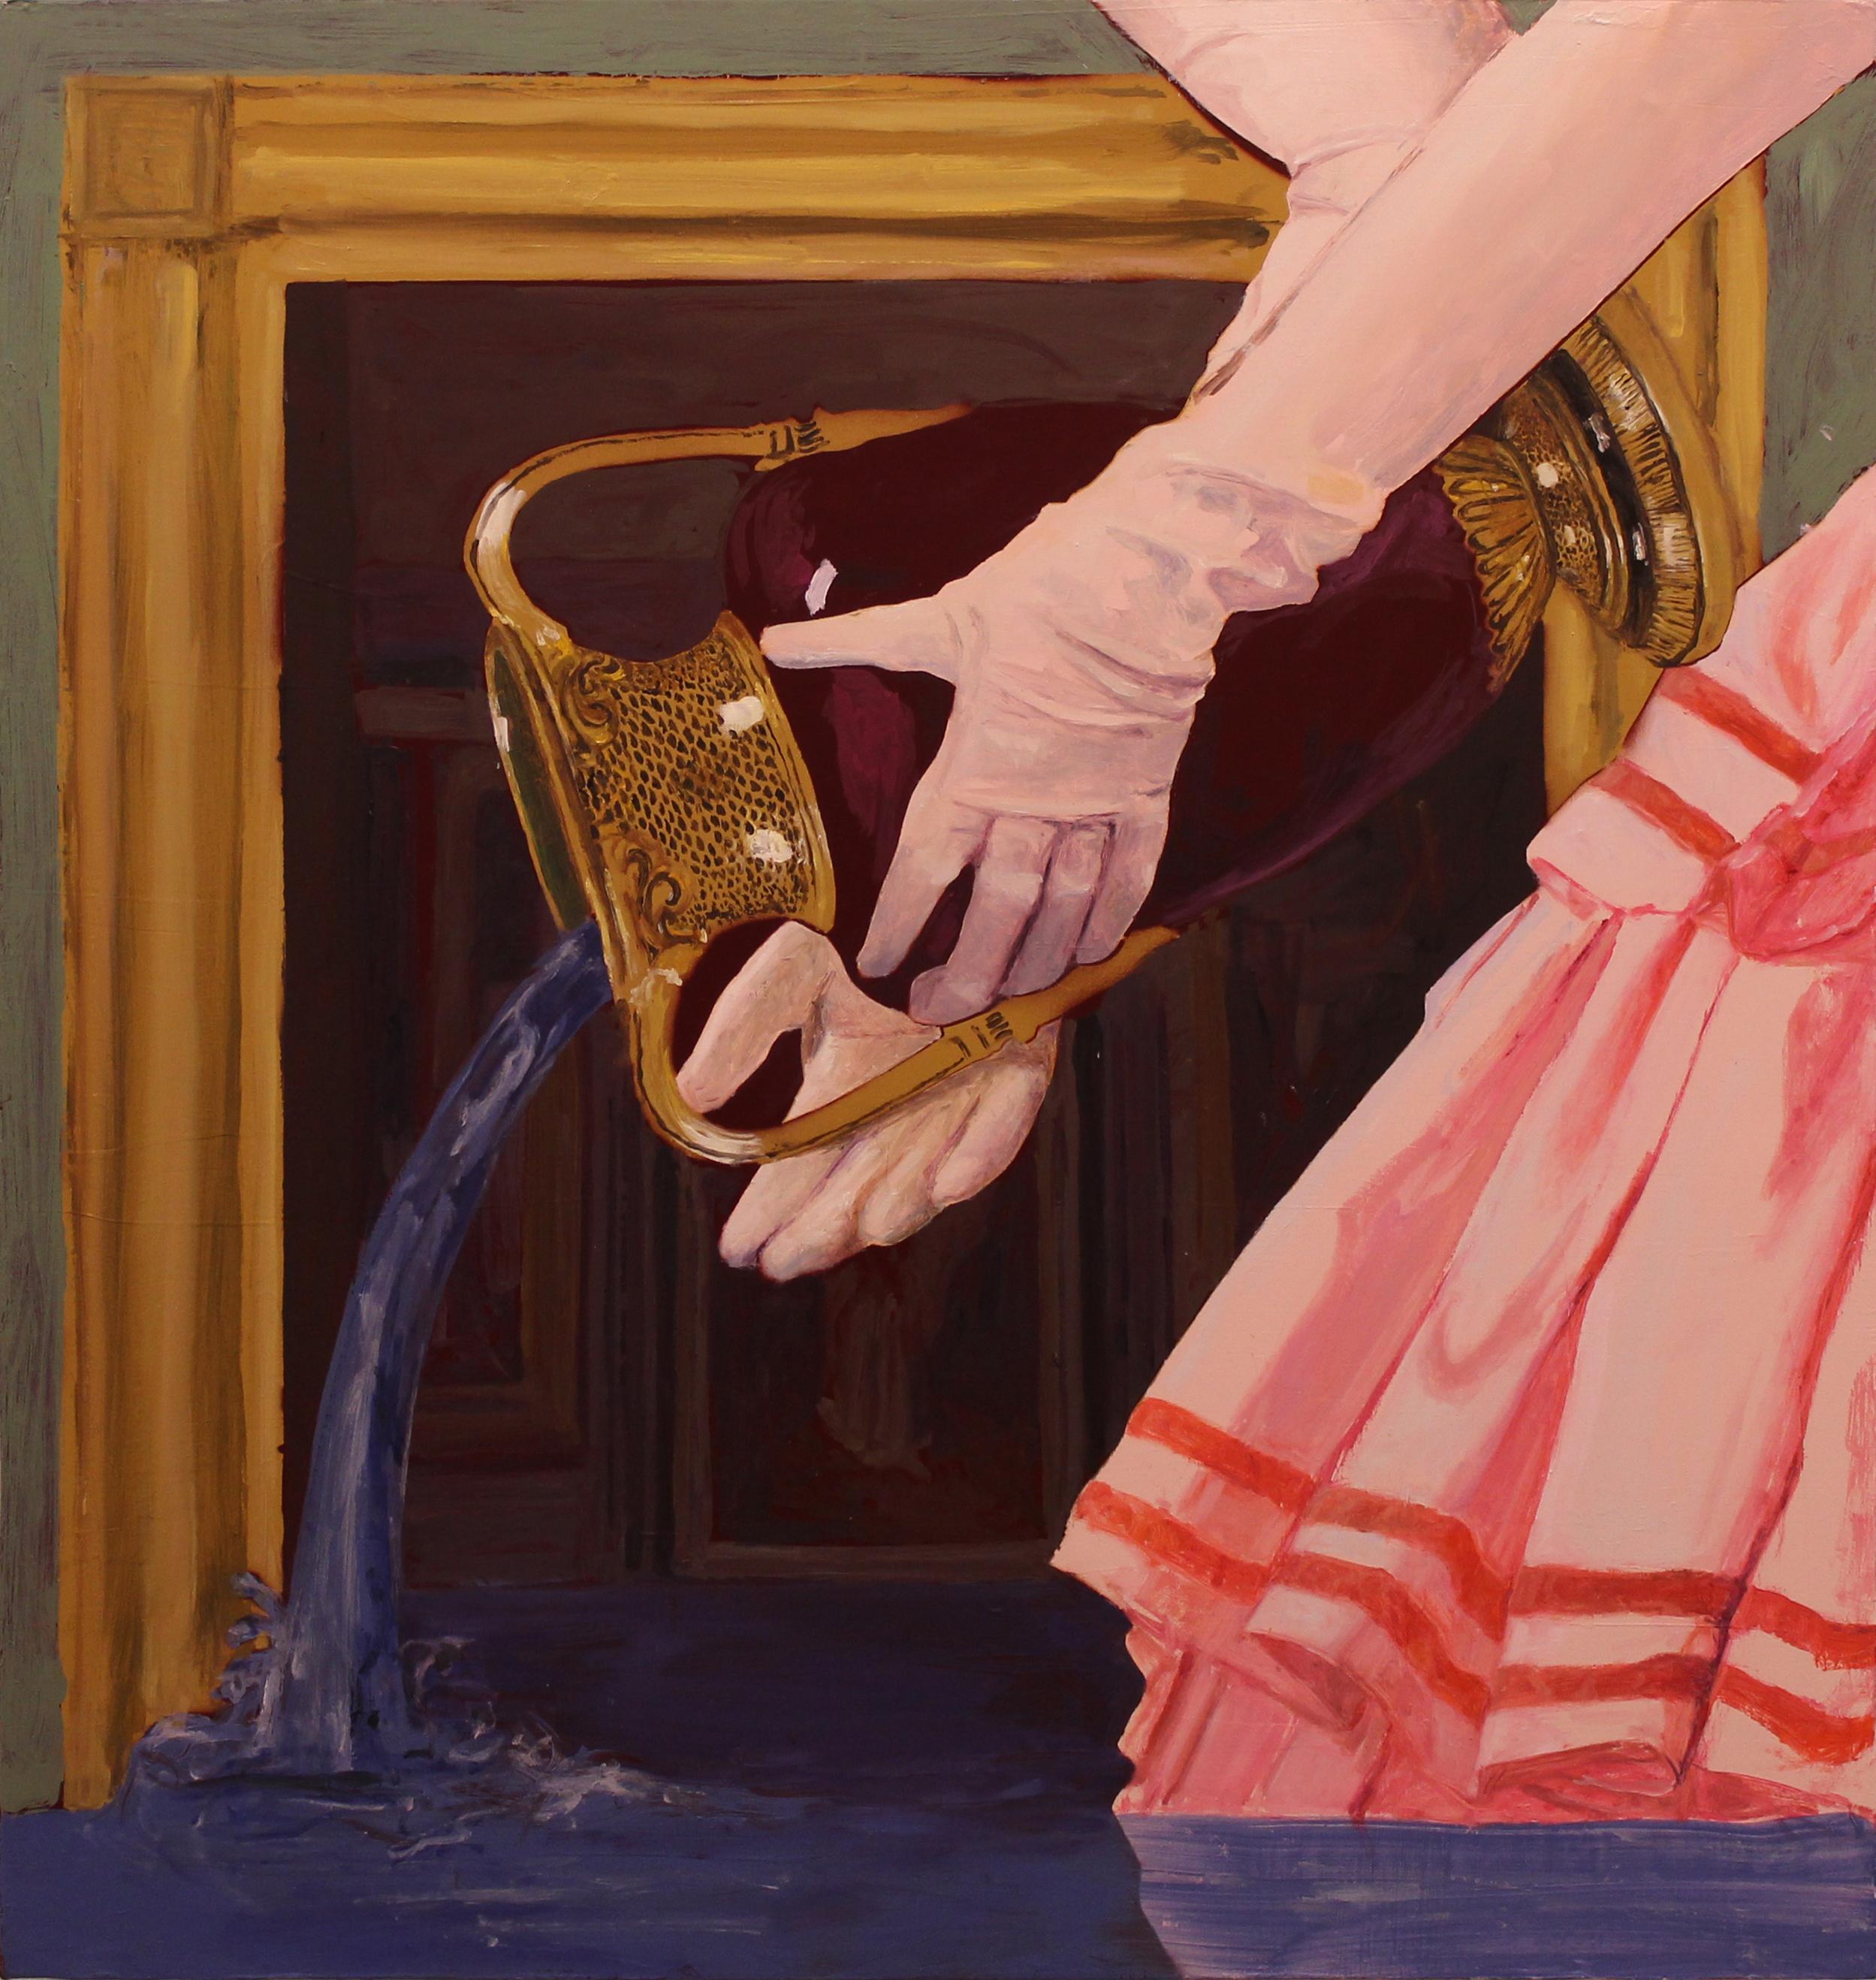 """Sabotage,"" Oil and Spray Paint on Panel, 2016, 36"" x 37.75"""